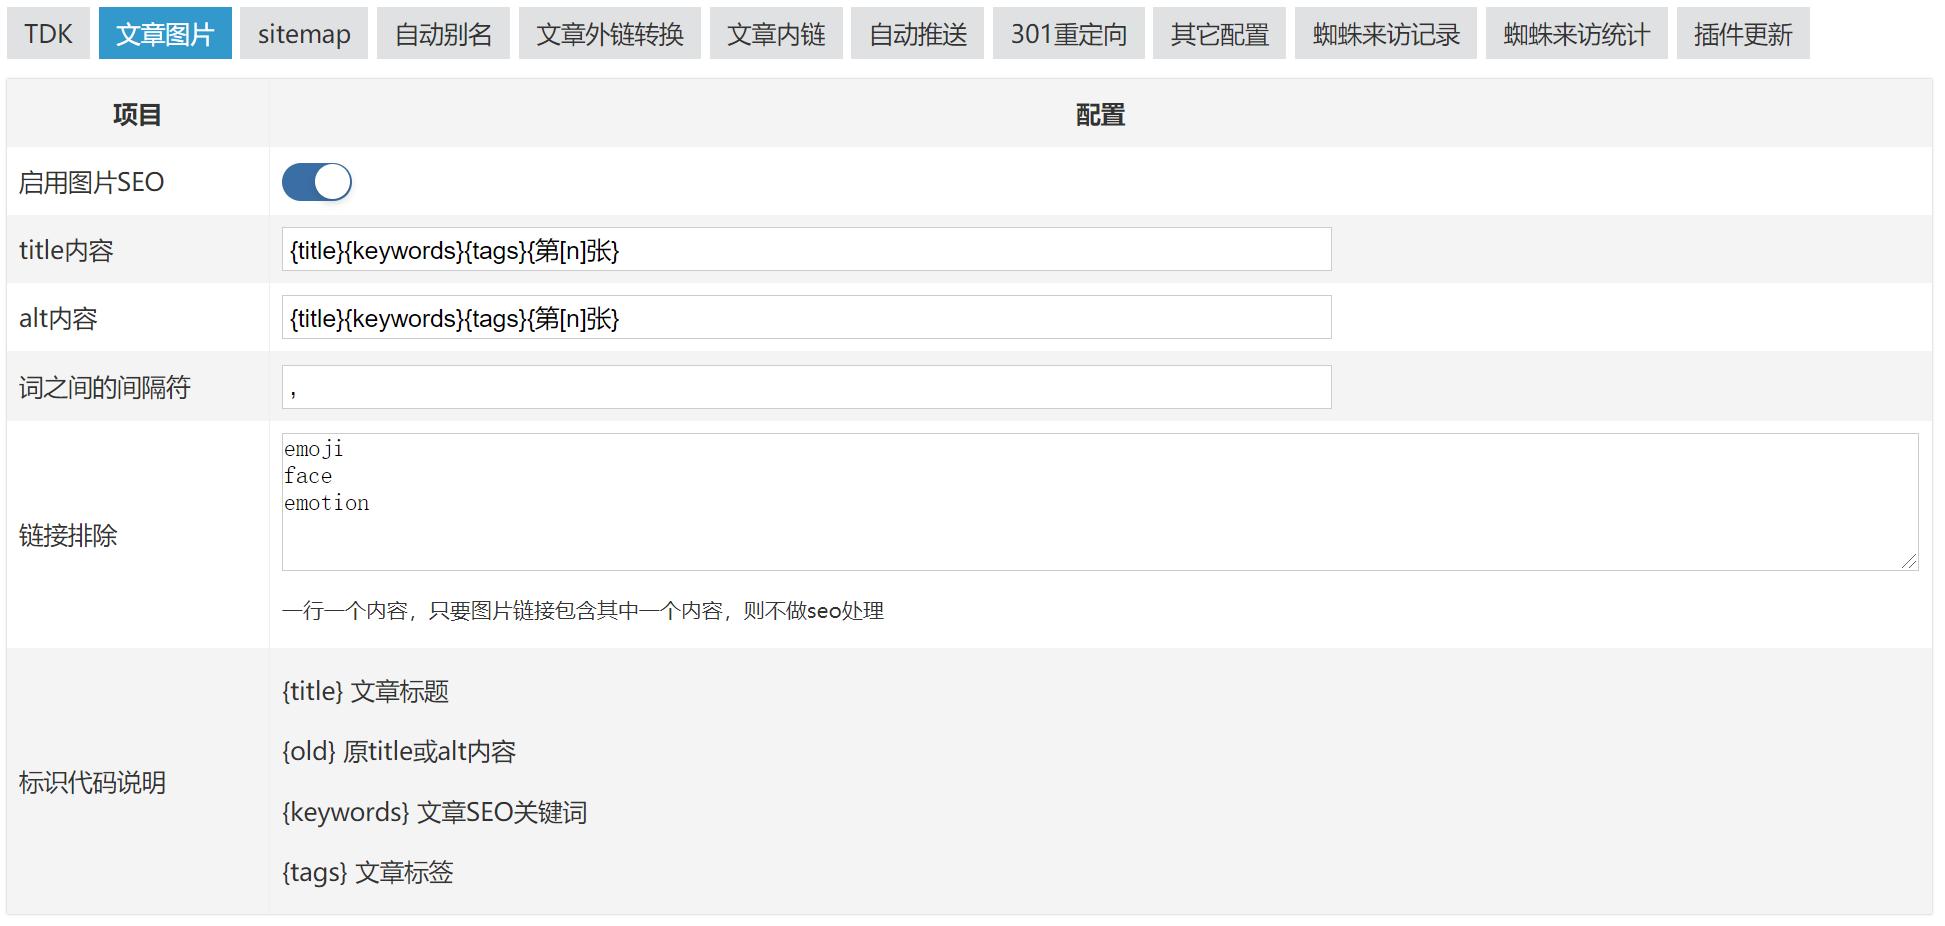 Zblog-超级SEO插件,建站必备,分享,zblog教程,Zblog,主题模板,建站,Zblog插件,超级SEO插件,第7张